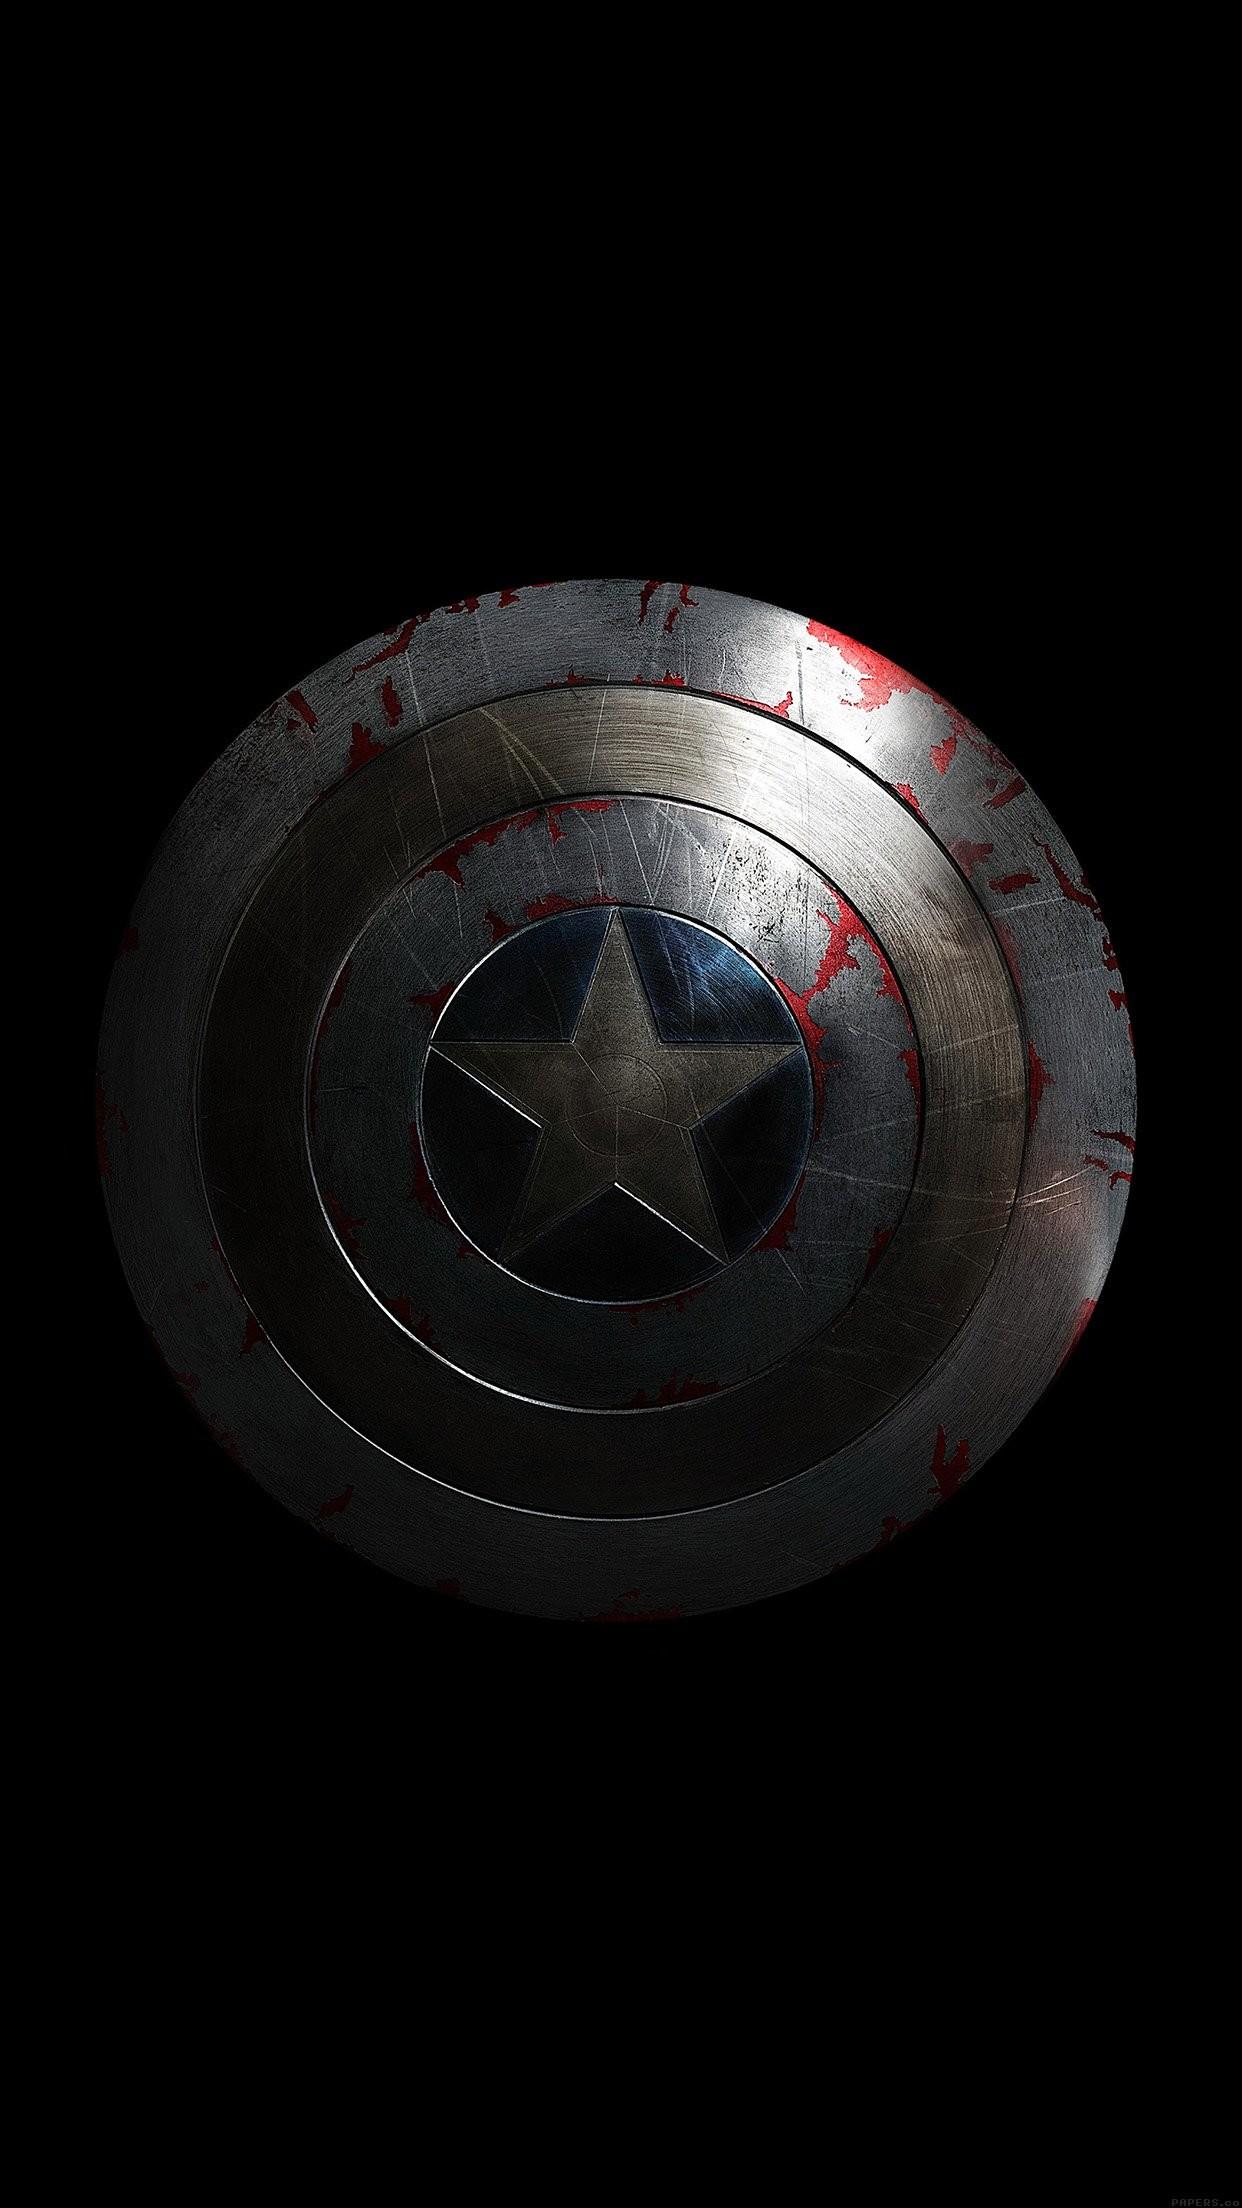 captain america avengers hero sheild small dark iPhone 7 plus wallpaper